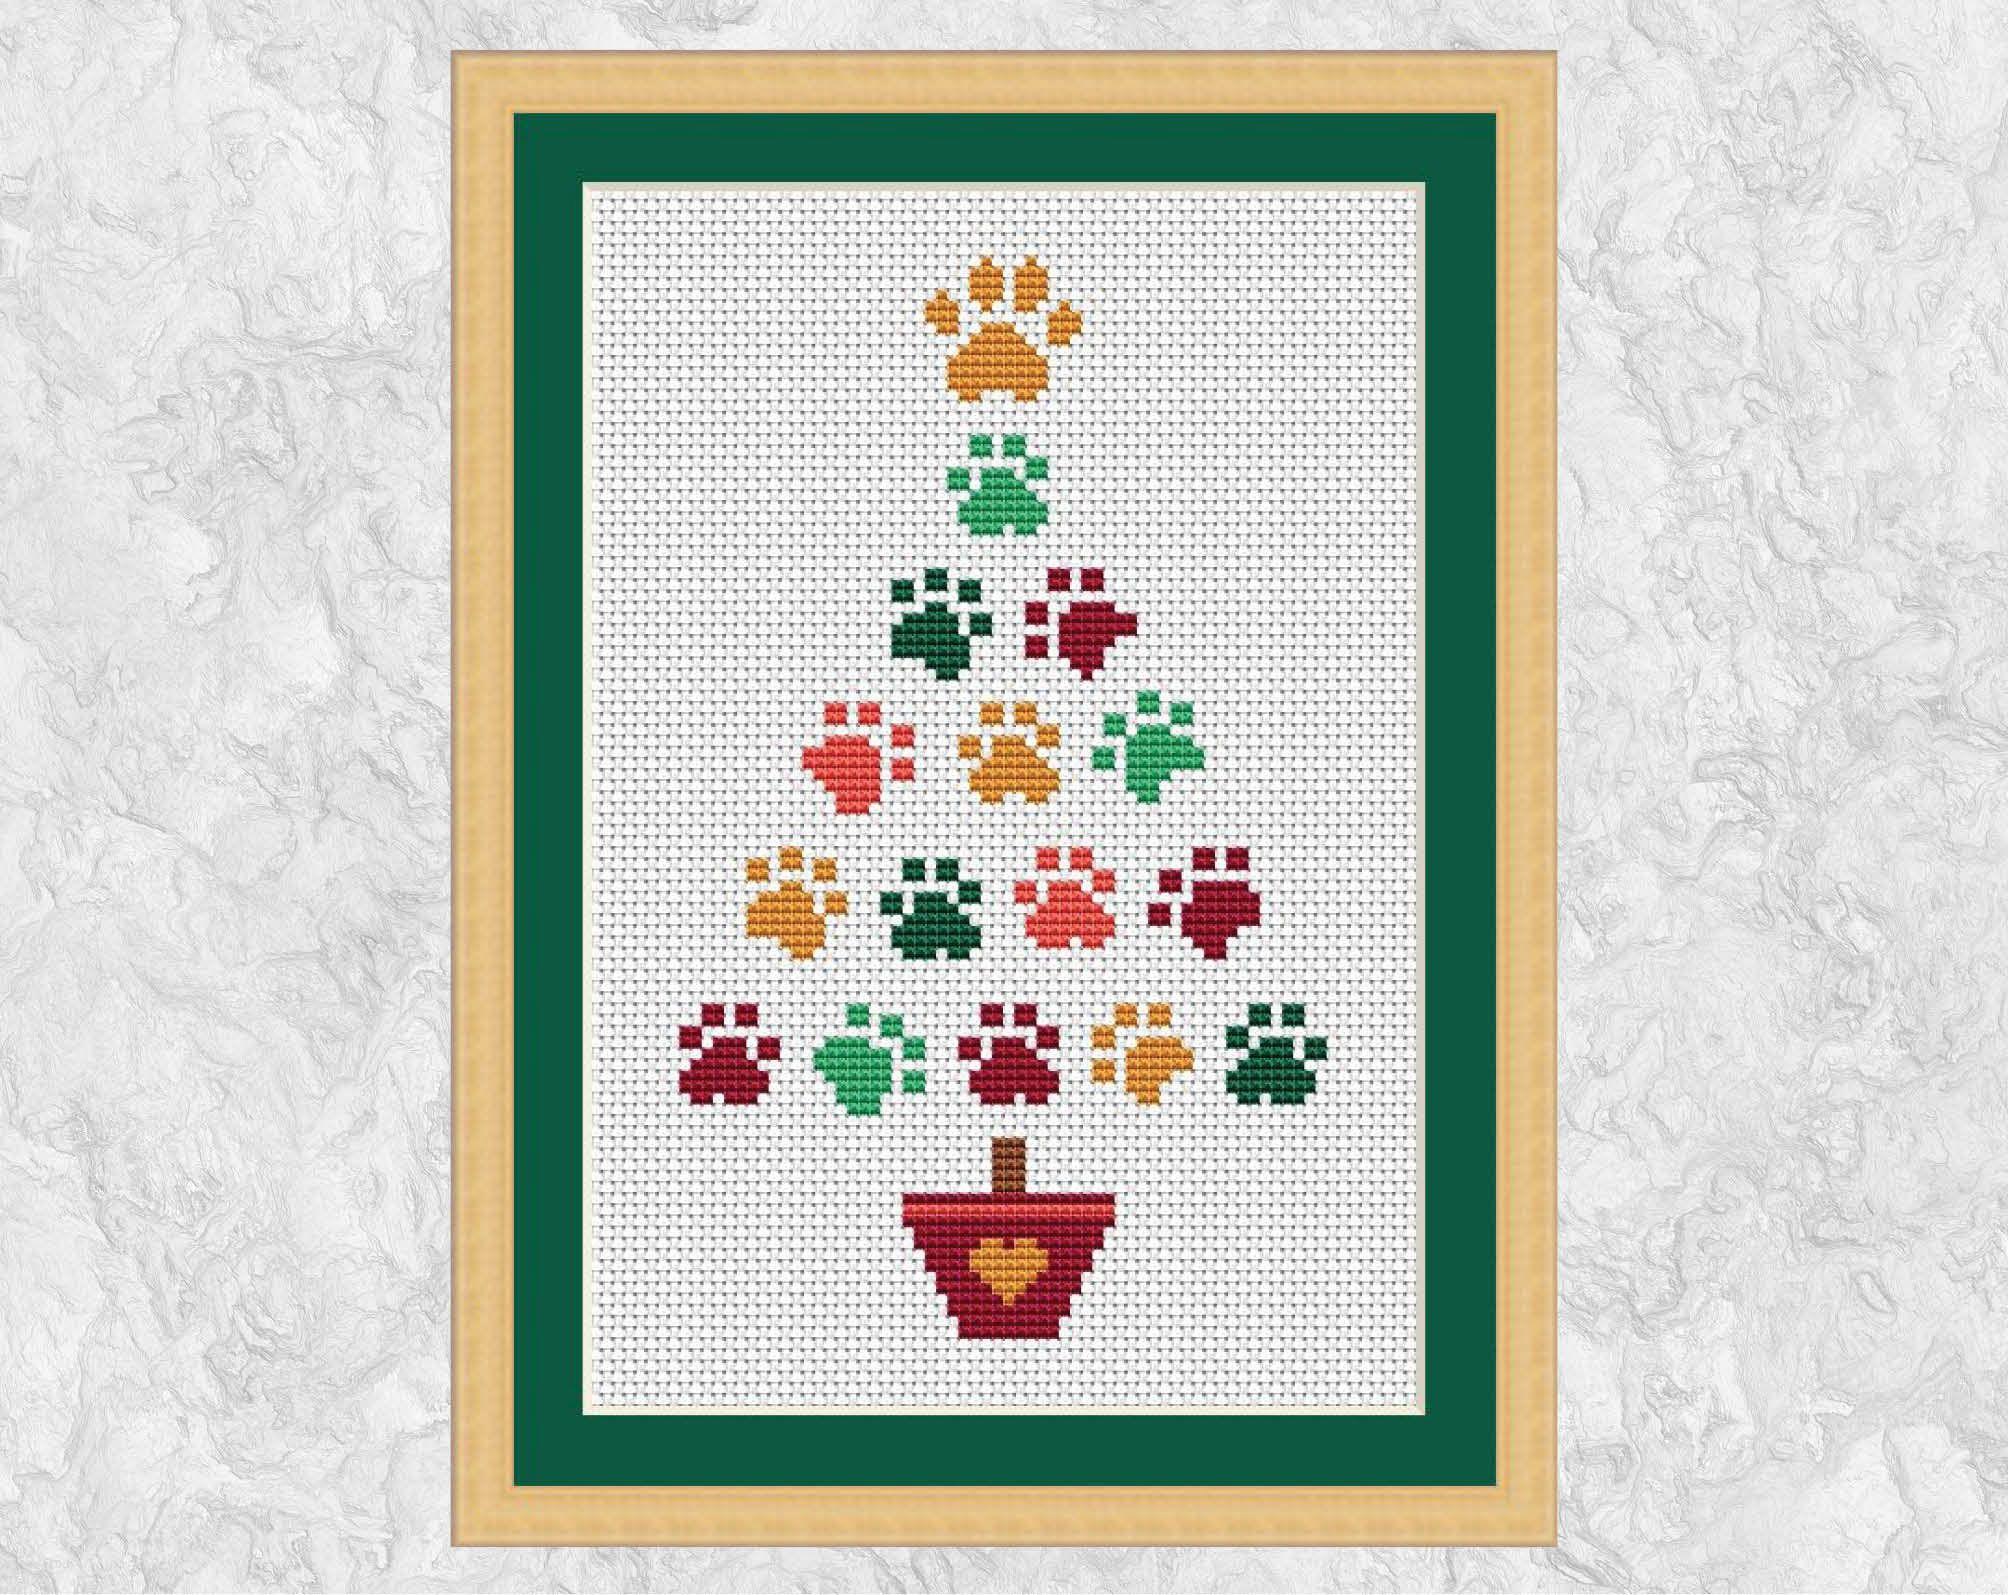 Paw Print Christmas Tree Cross Stitch Pattern Fun Easy Chart Etsy Cross Stitch Christmas Cards Cross Stitch Tree Christmas Cross Stitch Patterns Free